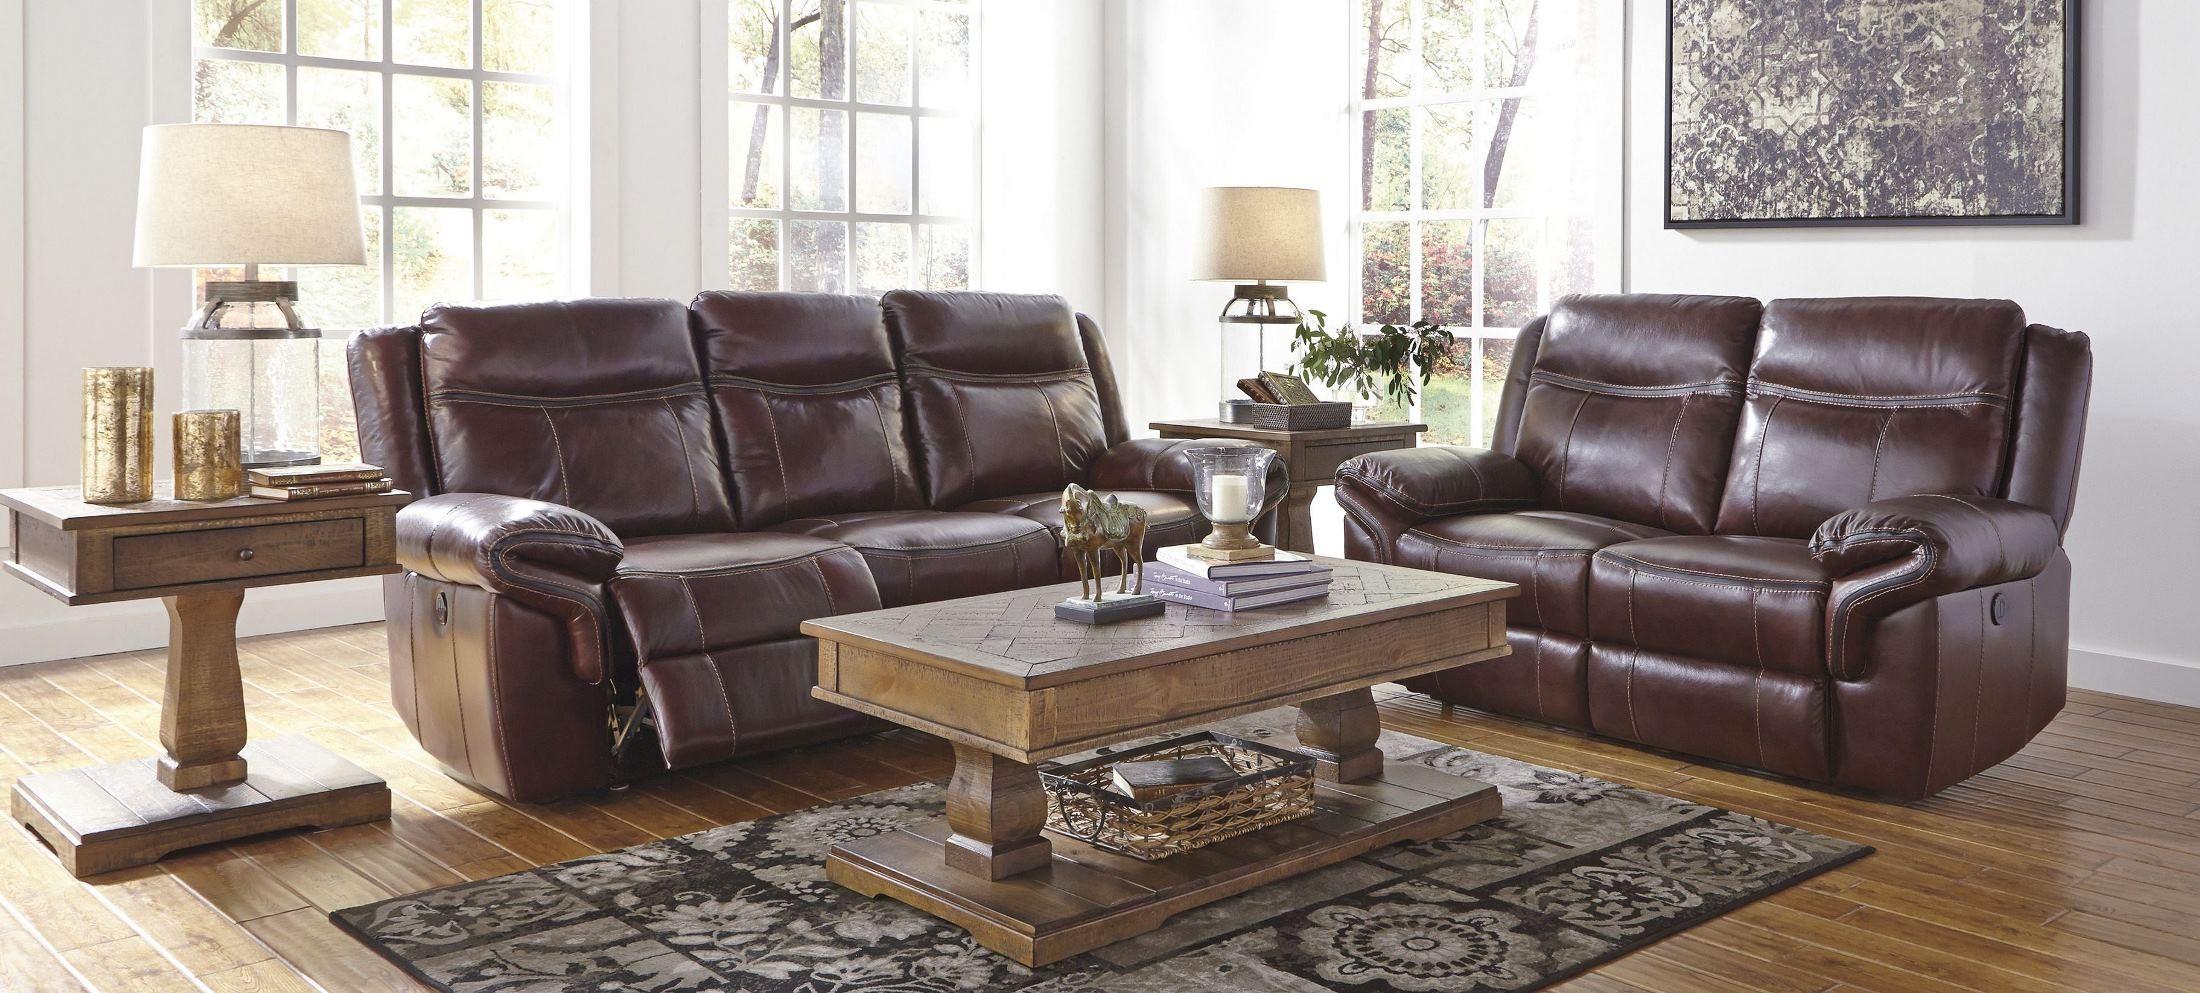 Zephen Mahogany Reclining Power Reclining Living Room Set